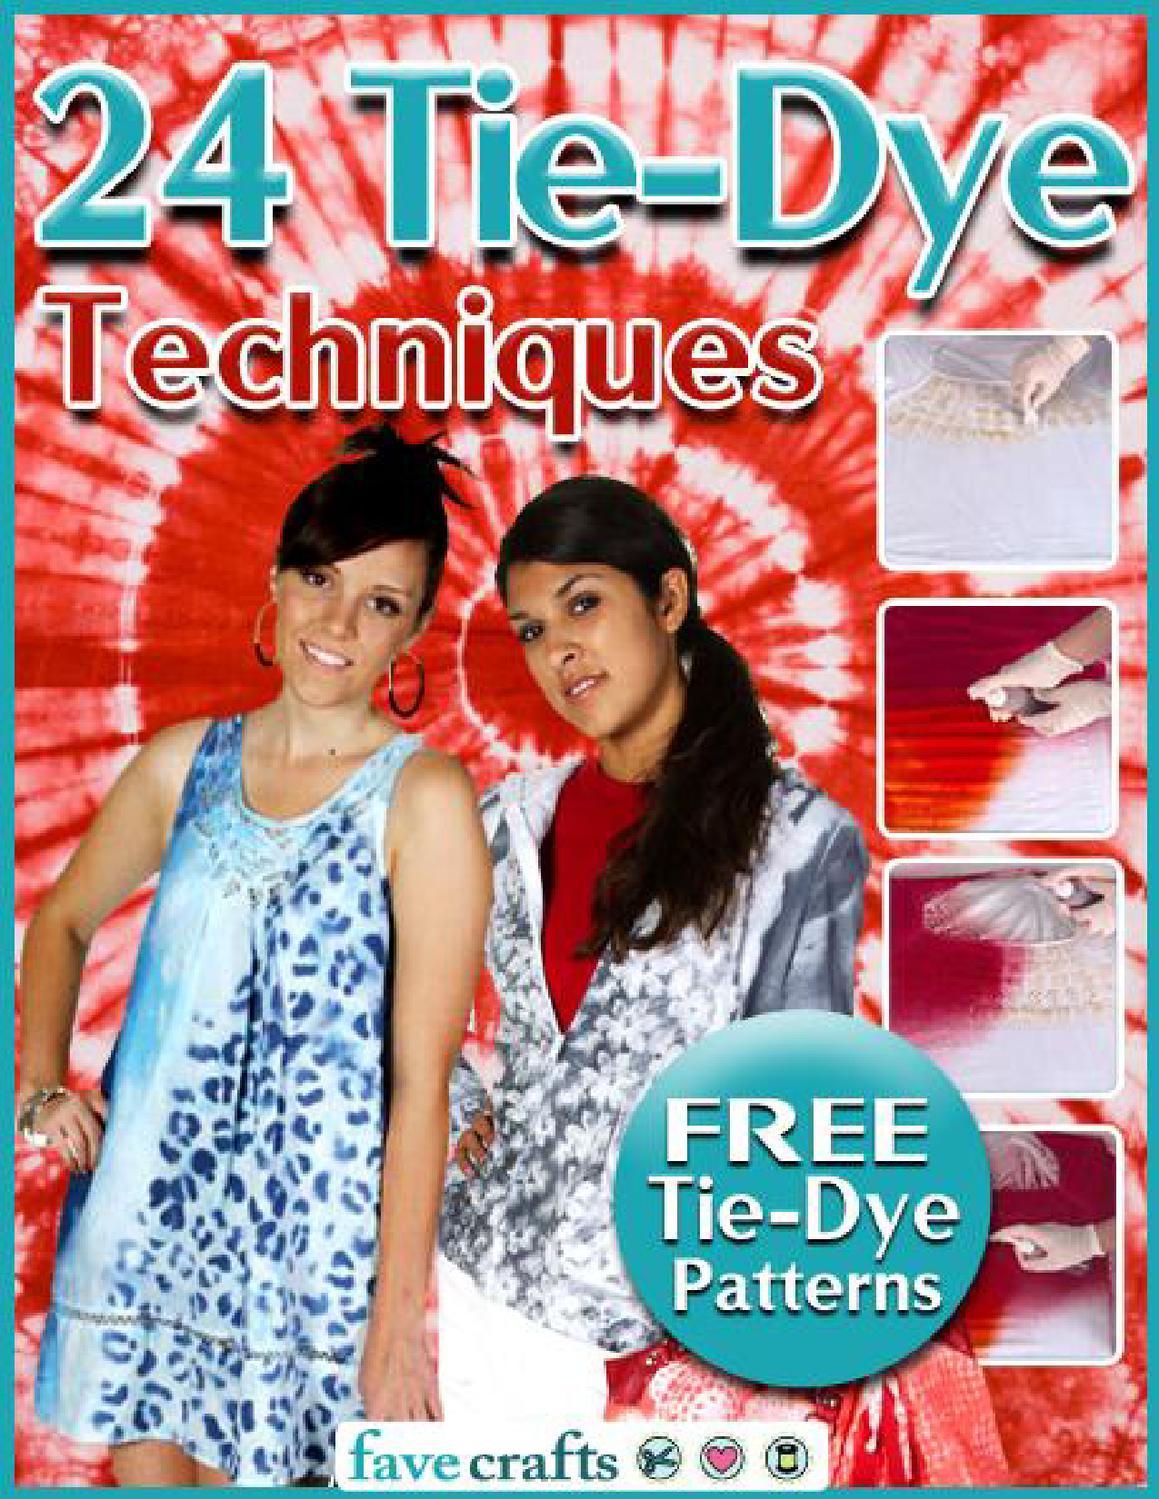 24 Tie Dye Techniques Free Tie Dye Patterns By Tiffany Sollog Issuu